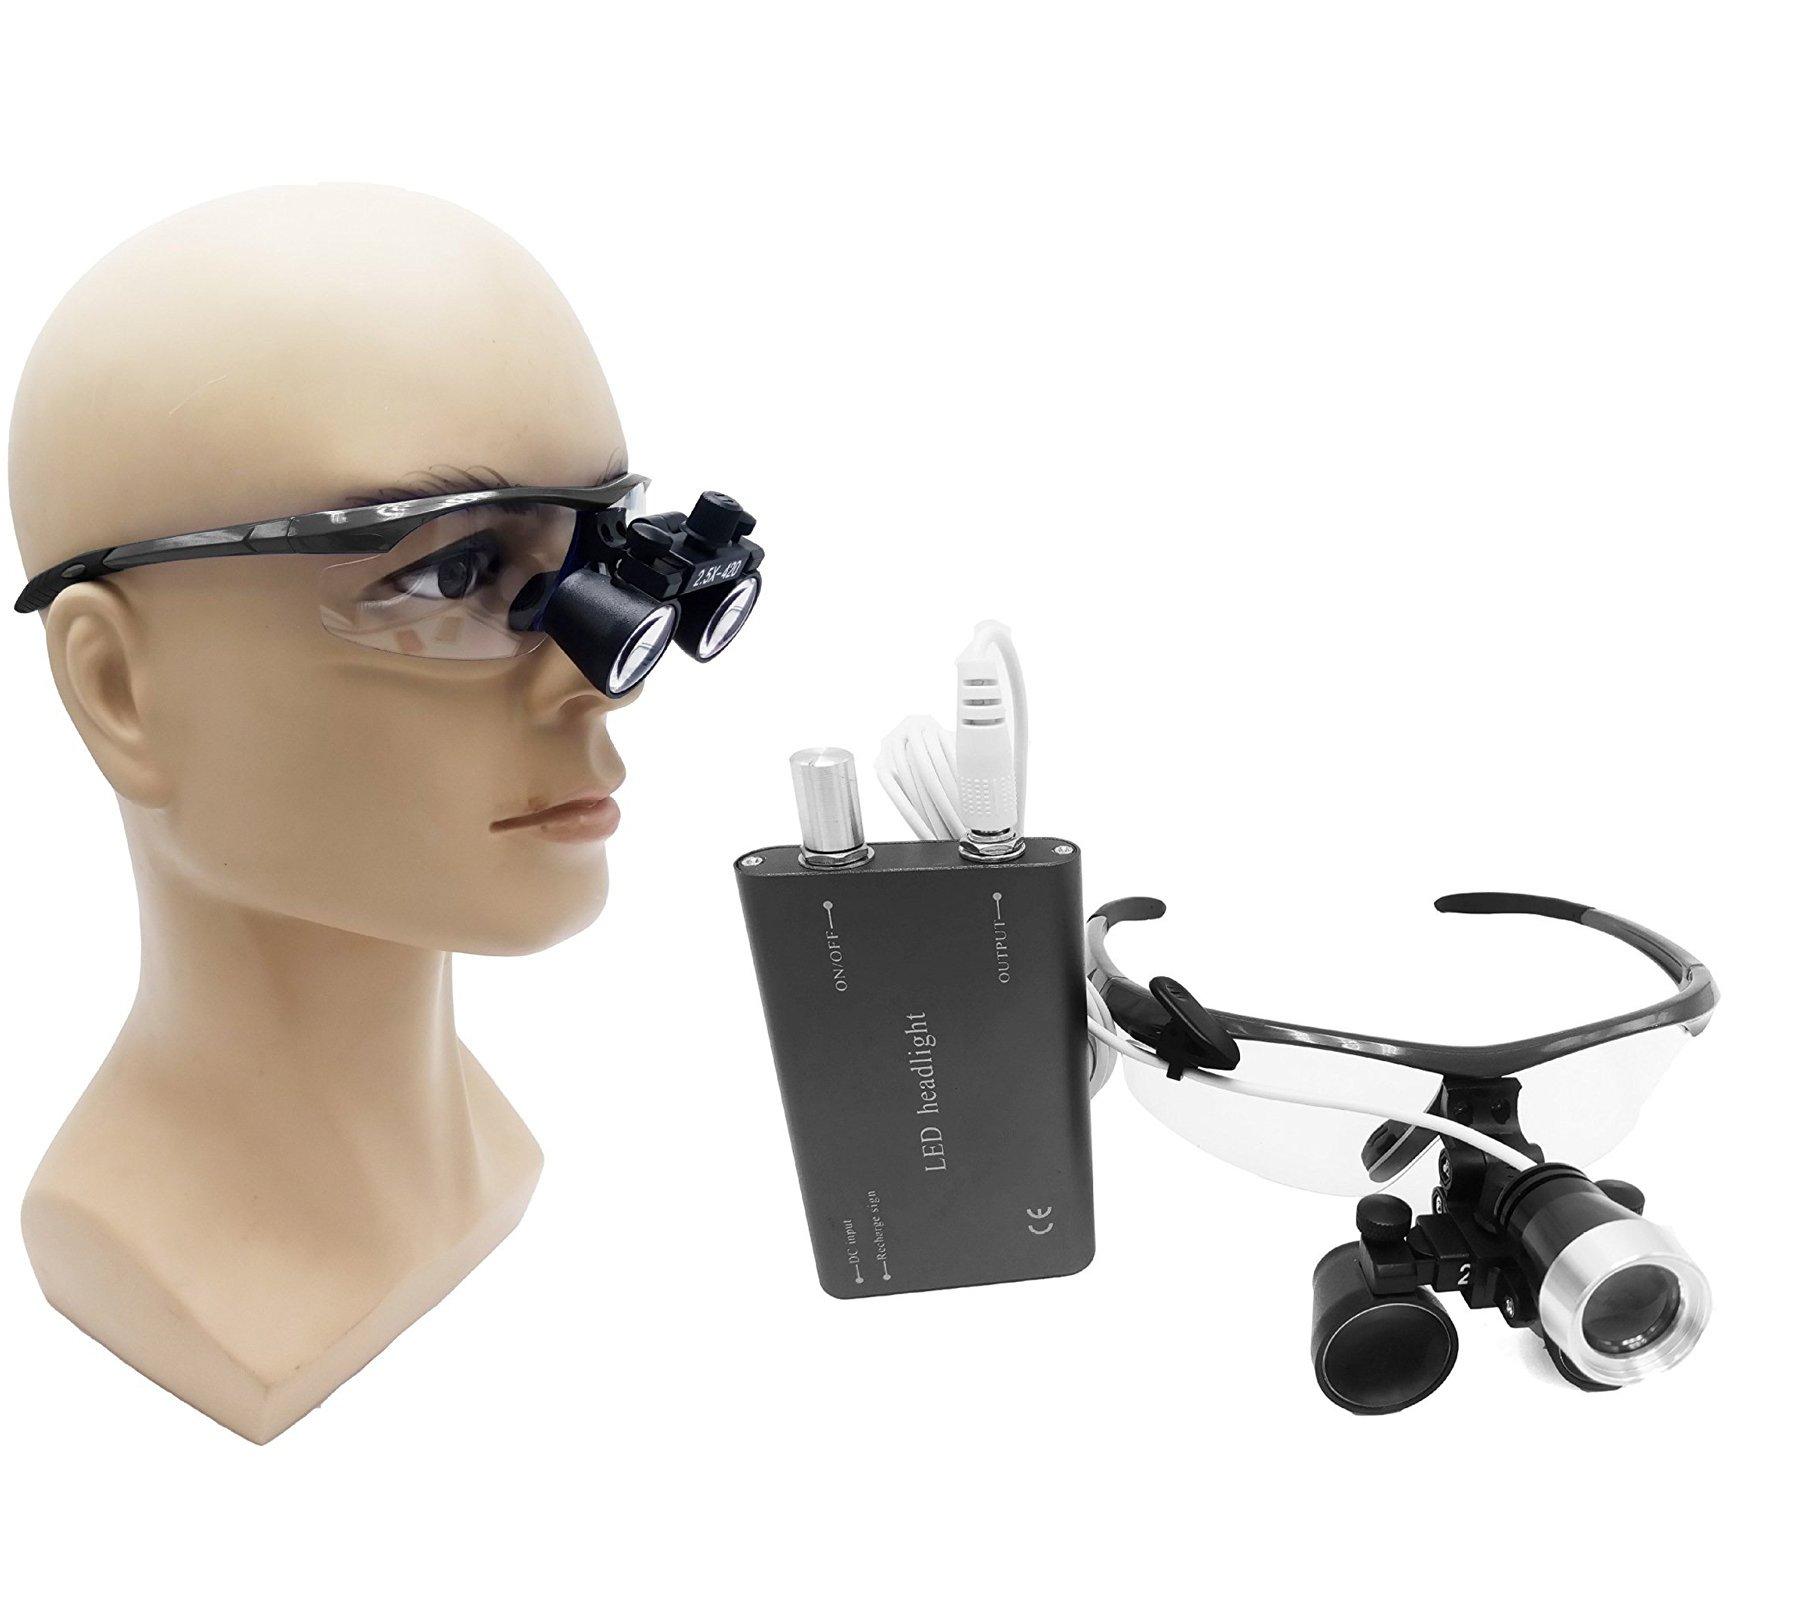 Zgood Portable Surgical Binocular Loupes 2.5X420mm Optical Glass + 3W LED HeadLight (Black) by ZGood